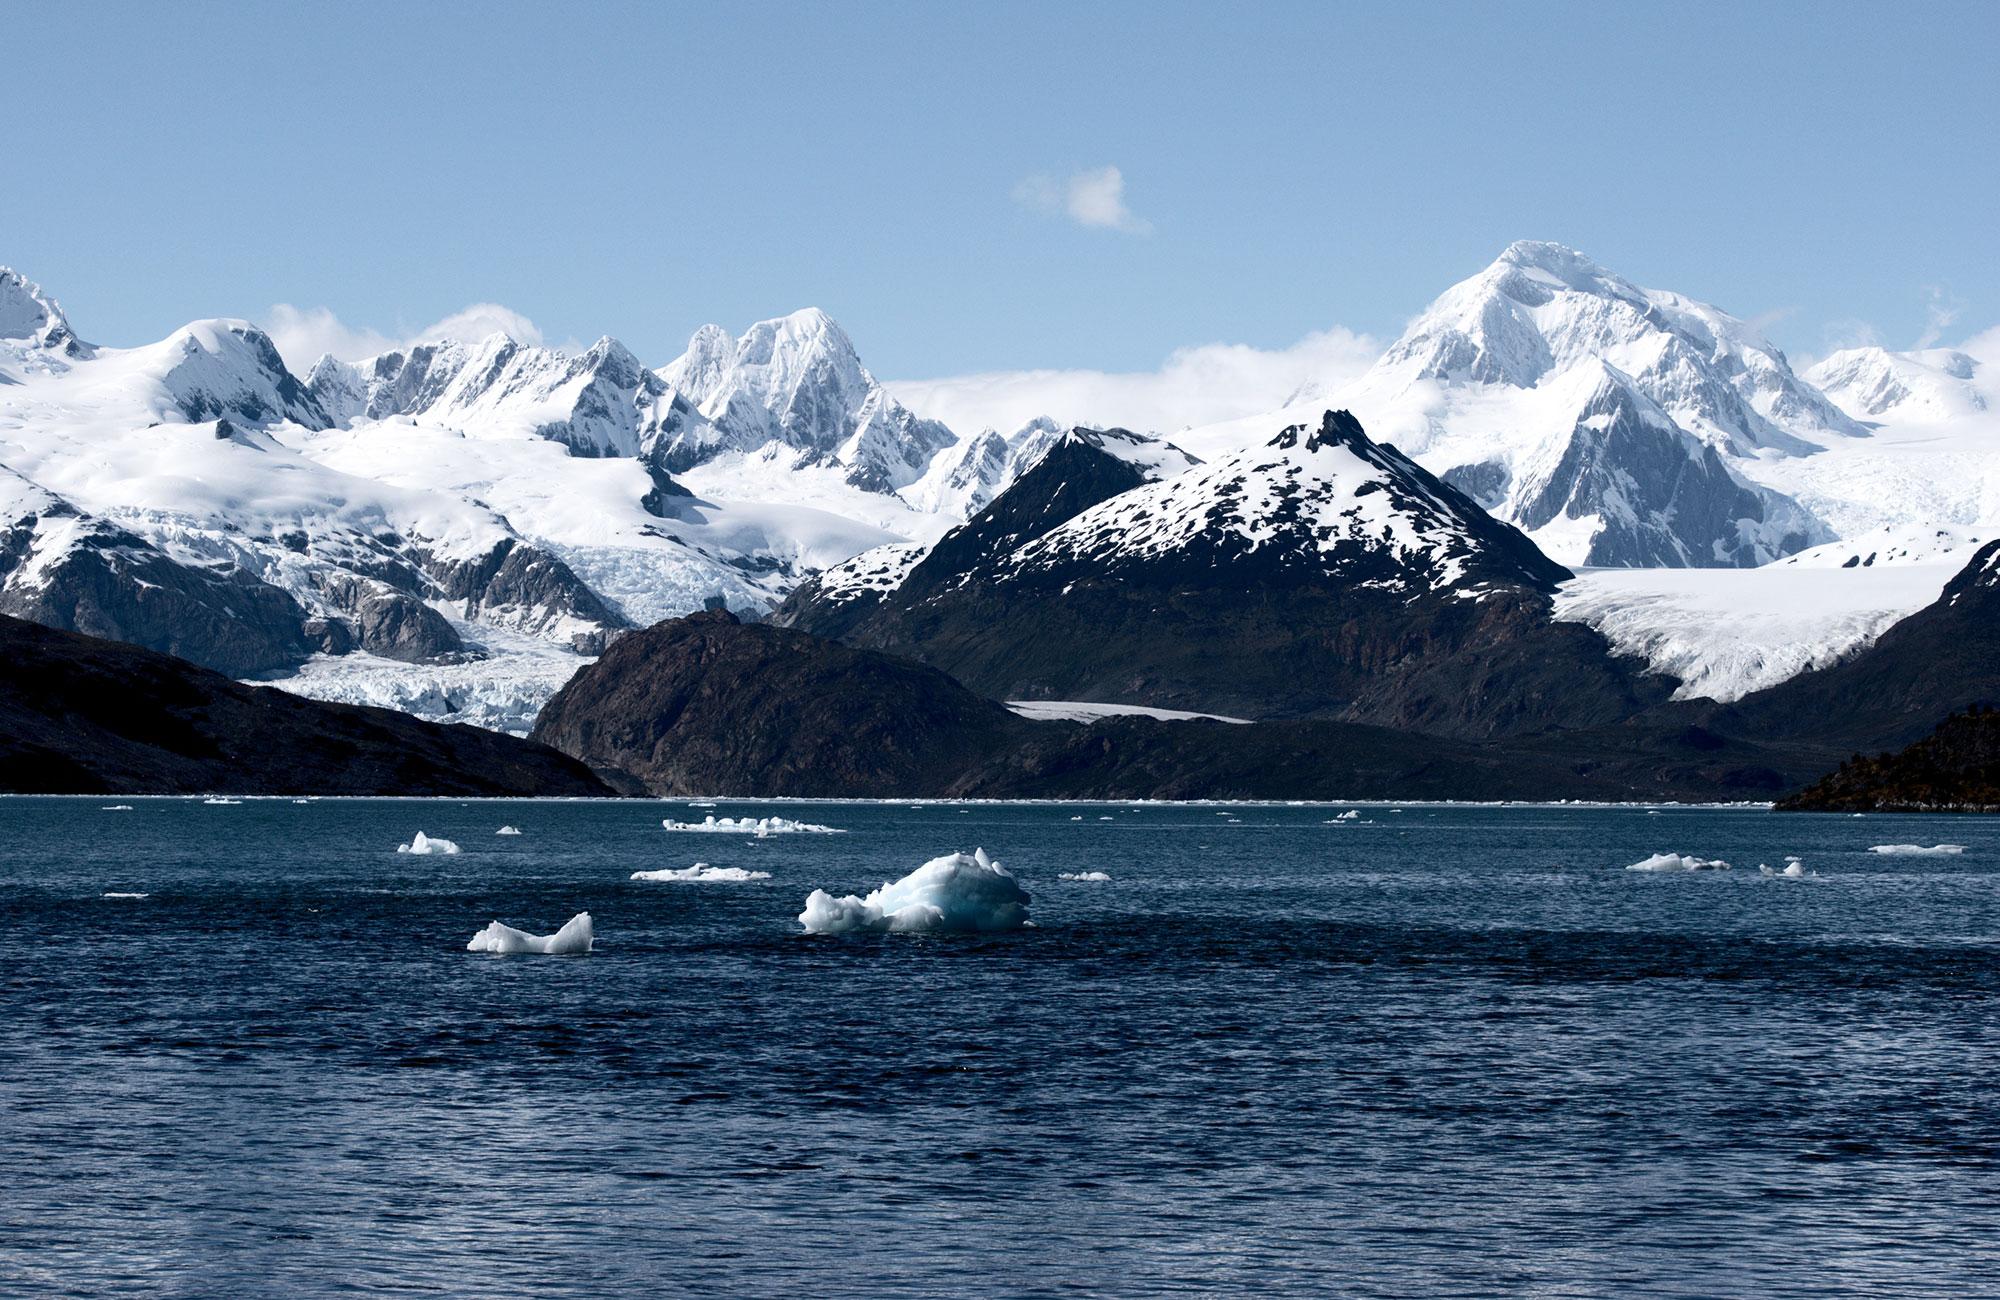 Voyage Chili Patagonie - Glacier Marinelli - Amplitudes